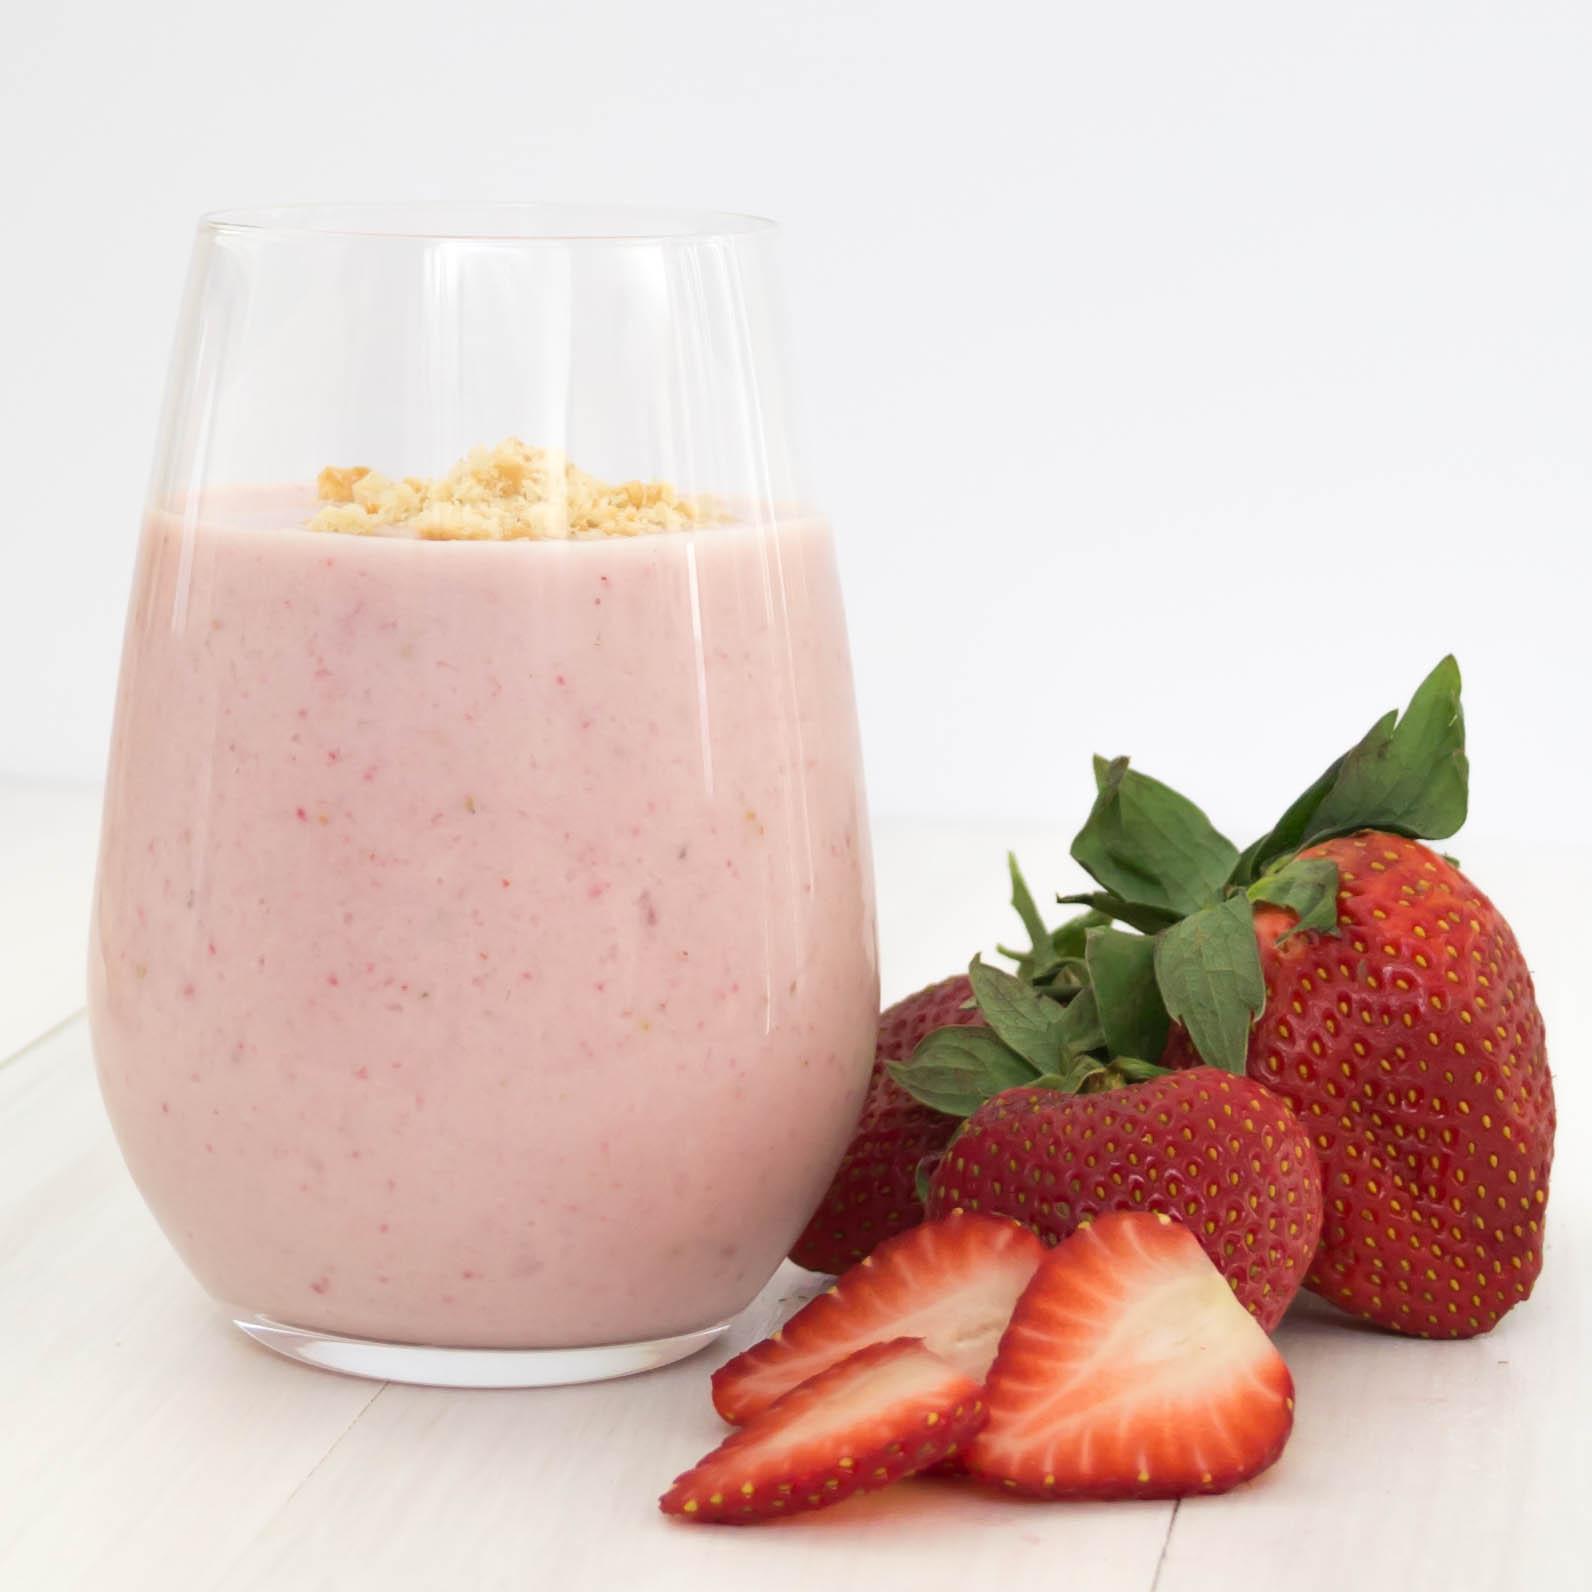 Whole Foods Smoothie Menu Playa Vista